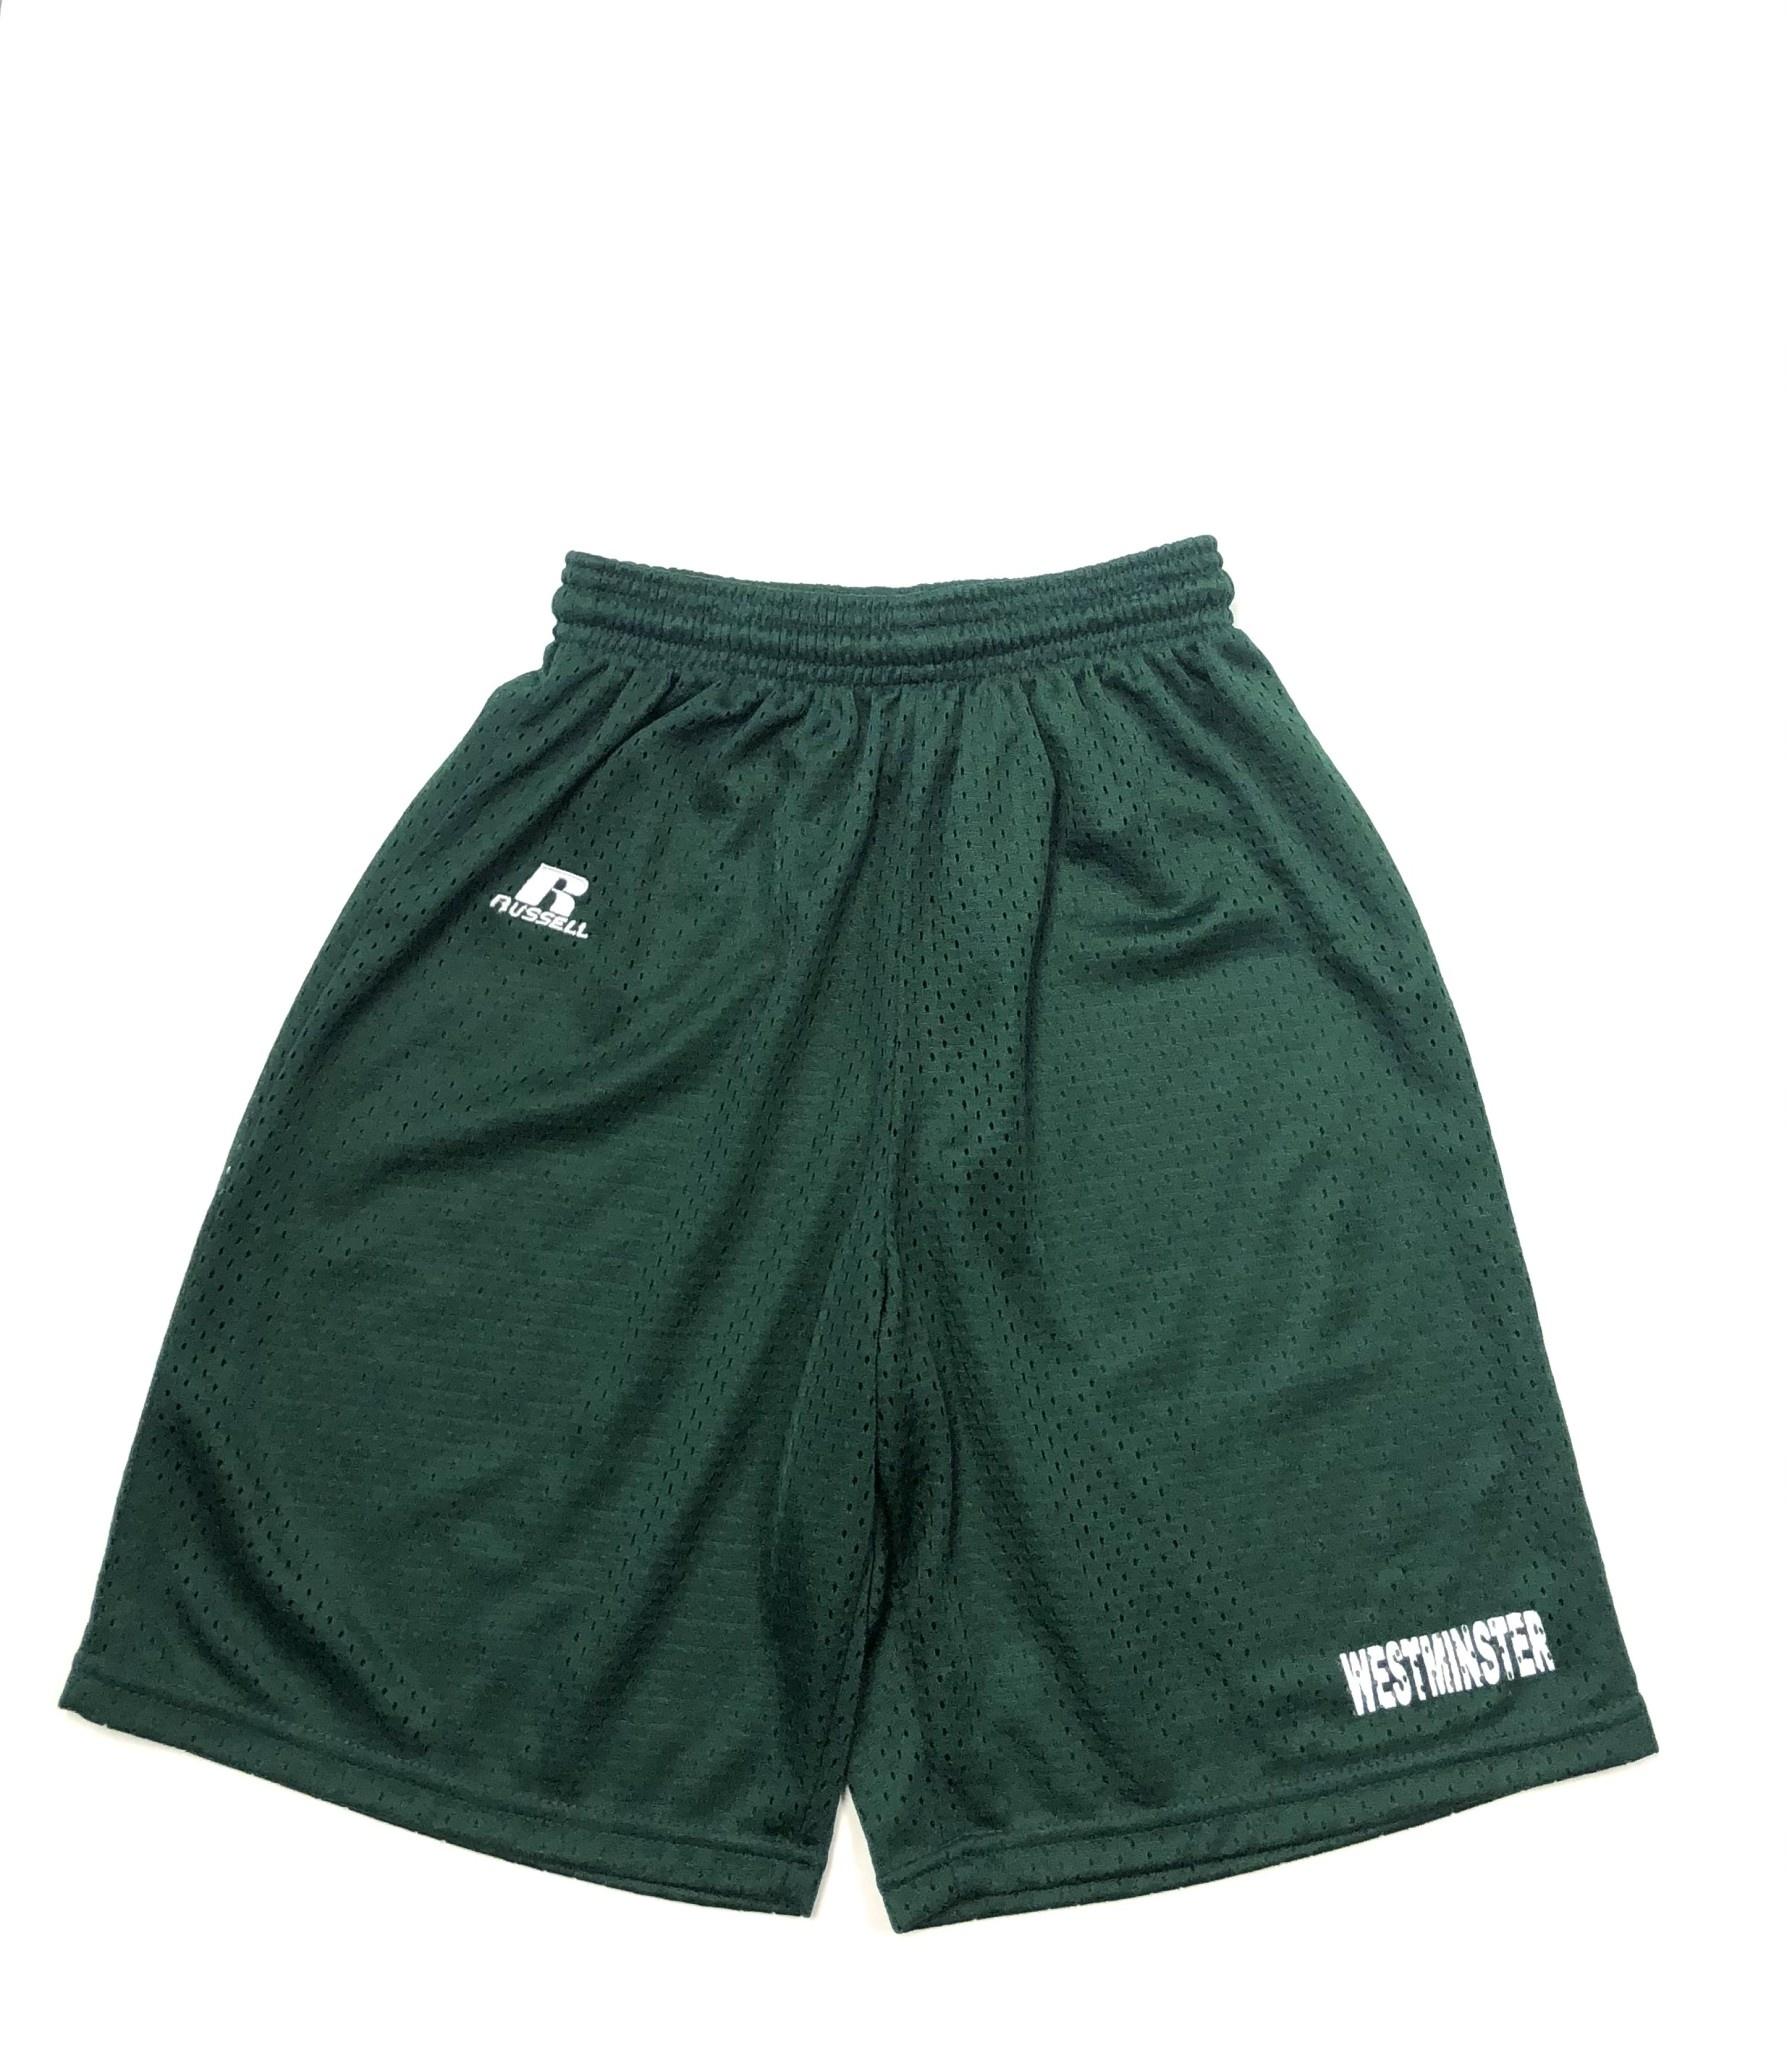 Shorts: Russell YS Green Mesh